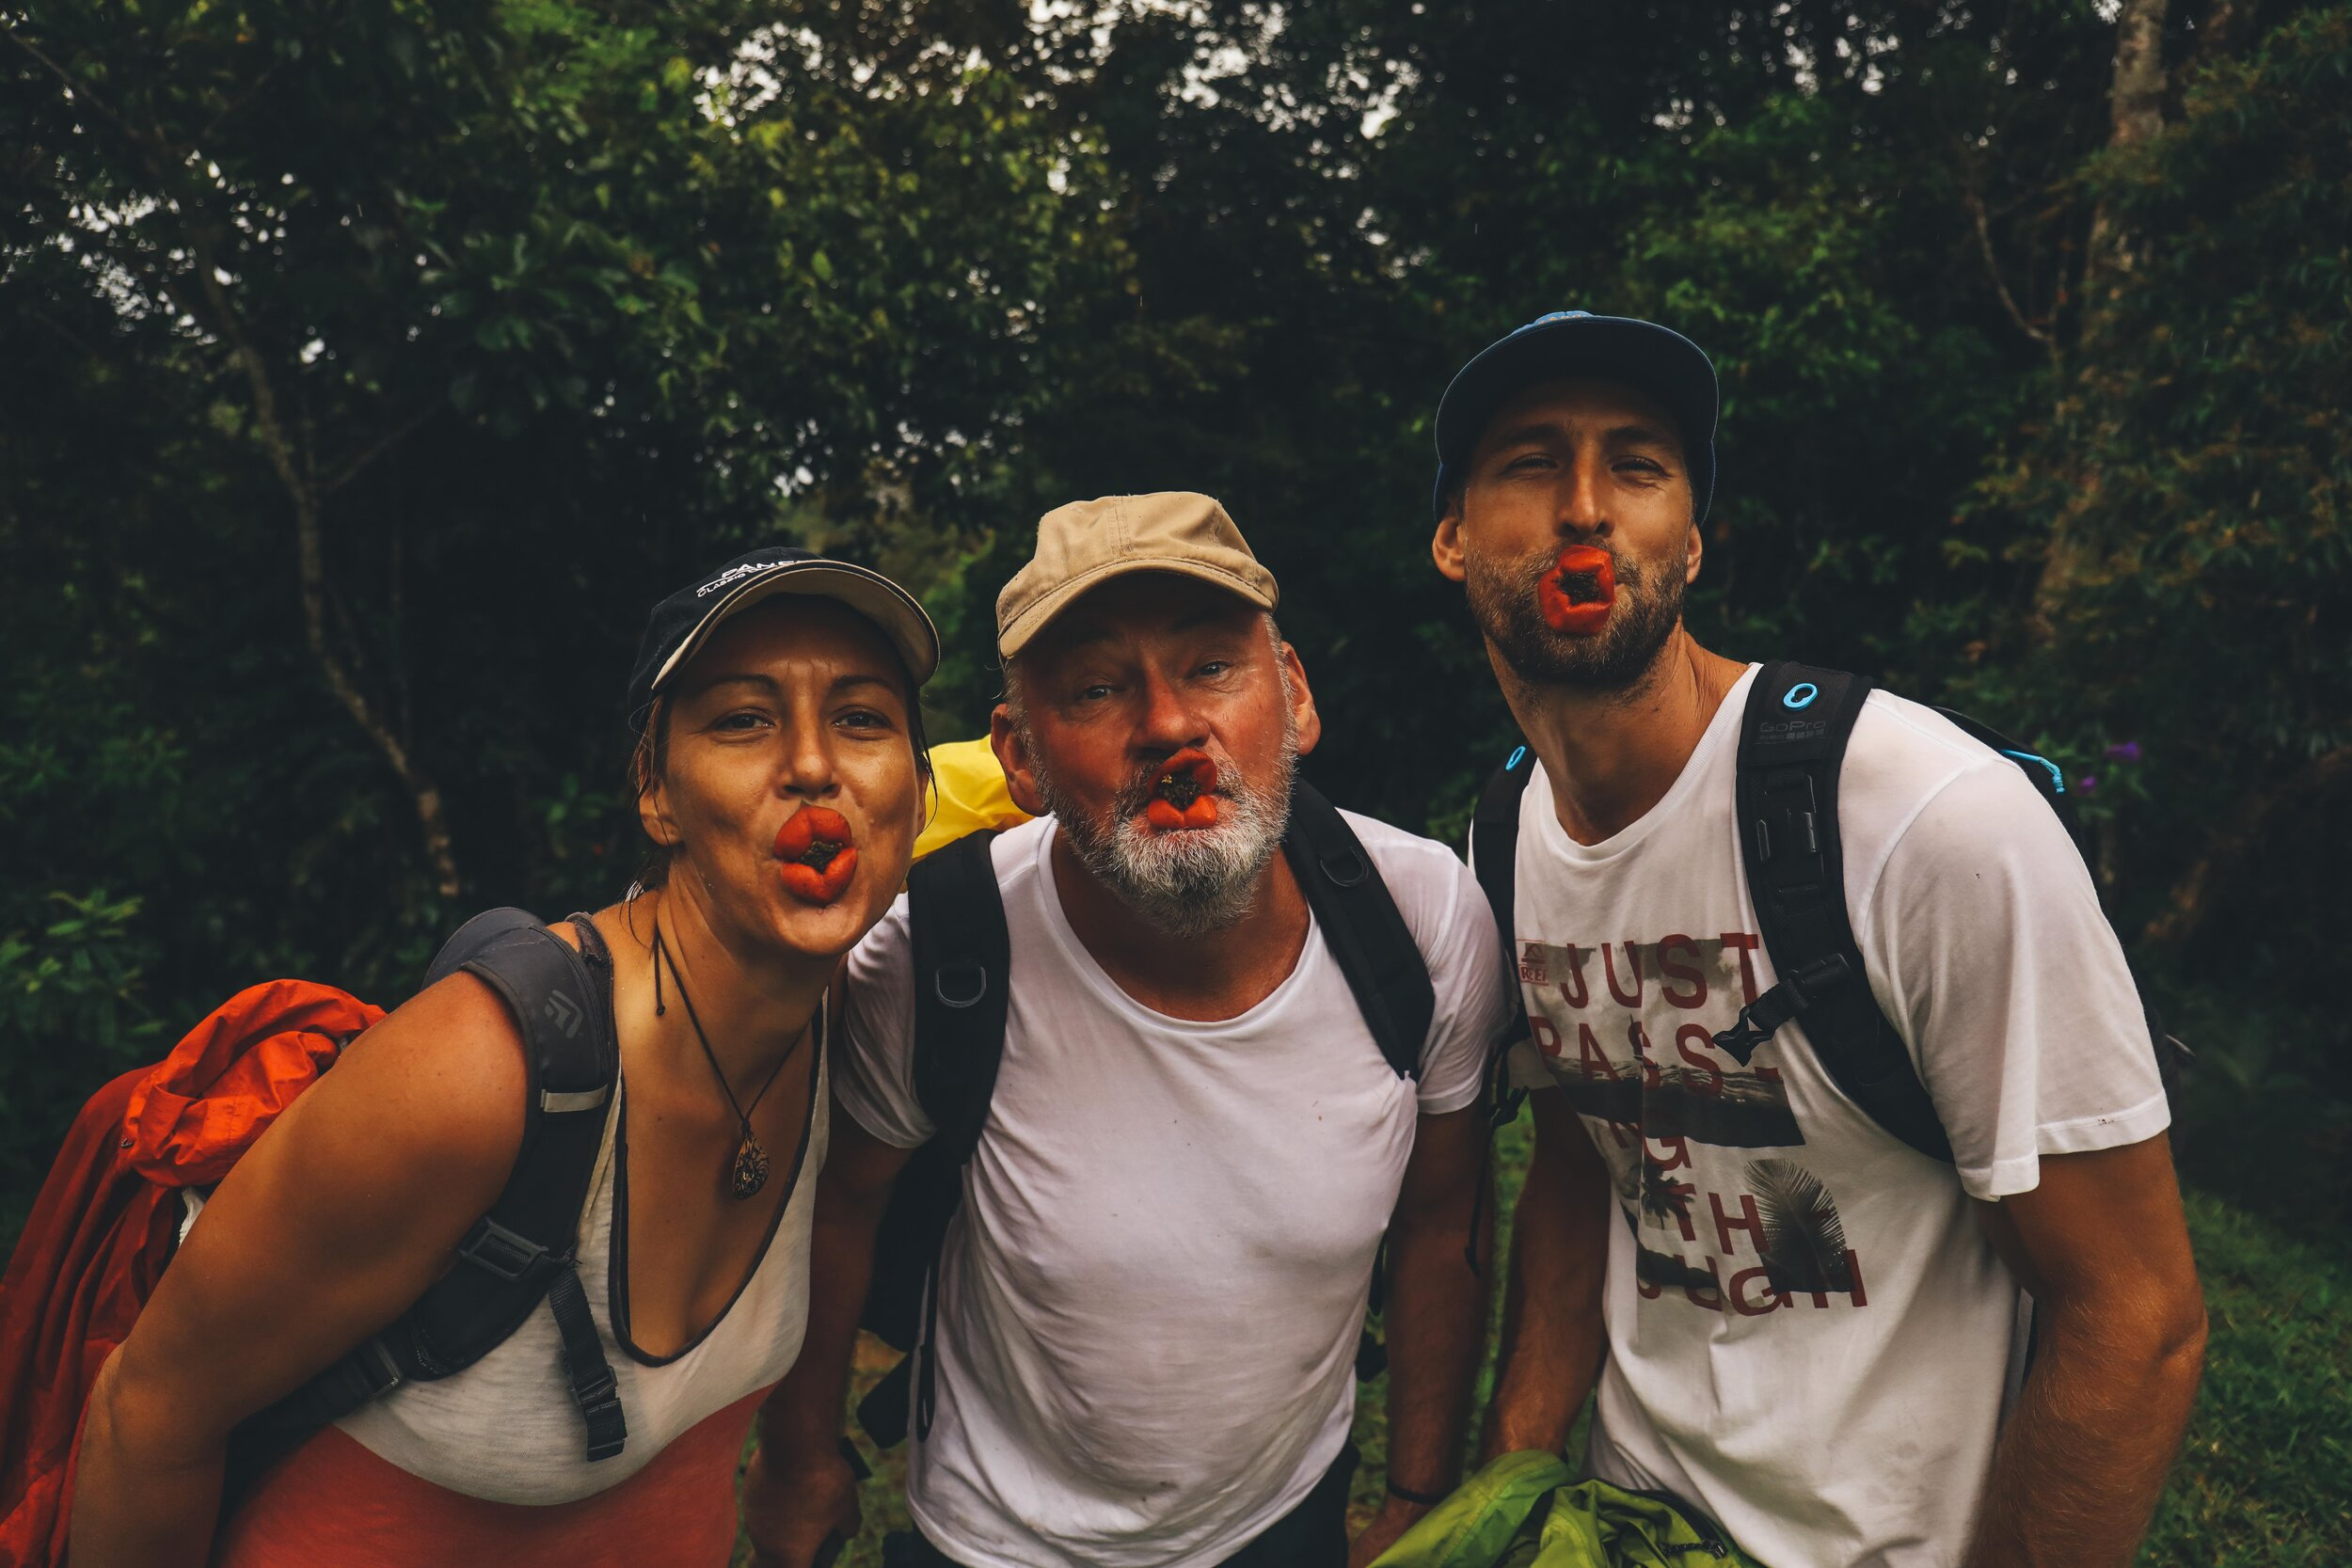 Hiking with our friends on S/V Johana and White Shadow.